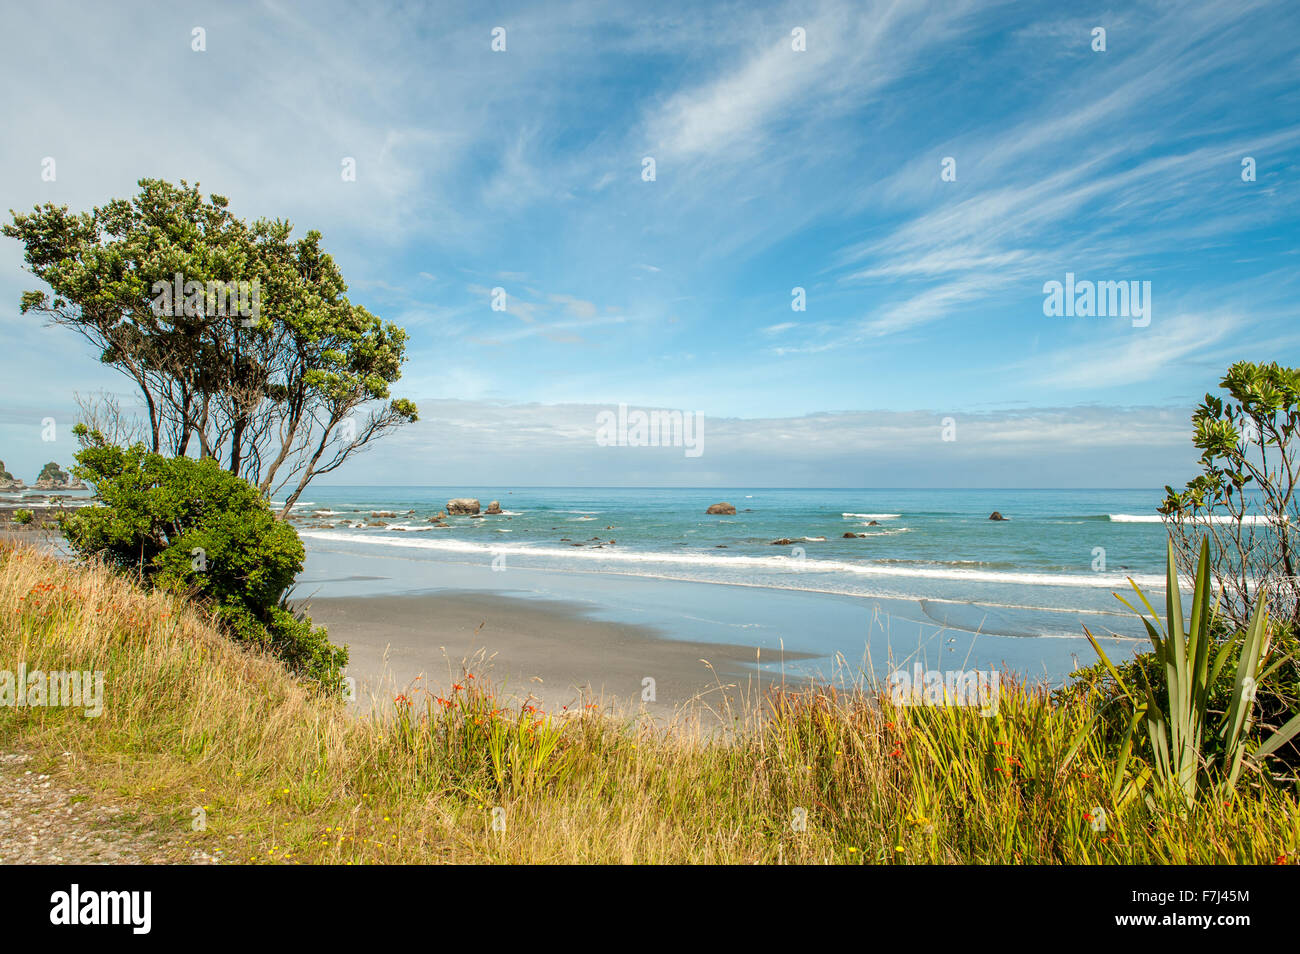 Tasman sea rolls in south of Punakaiki, South Island, New Zealand - Stock Image